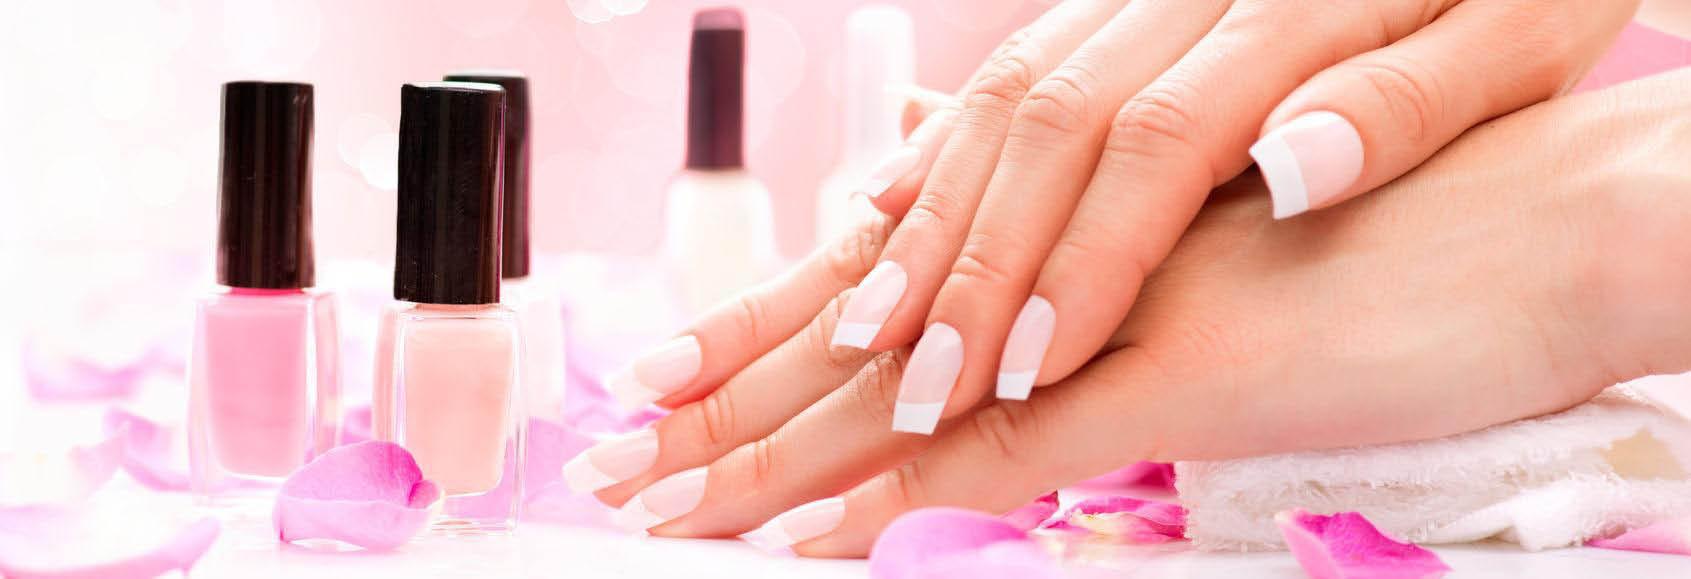 mimi nails and spa,mimi nails bensalem pa,spa coupons,manicure coupons,nail salon bensalem pa